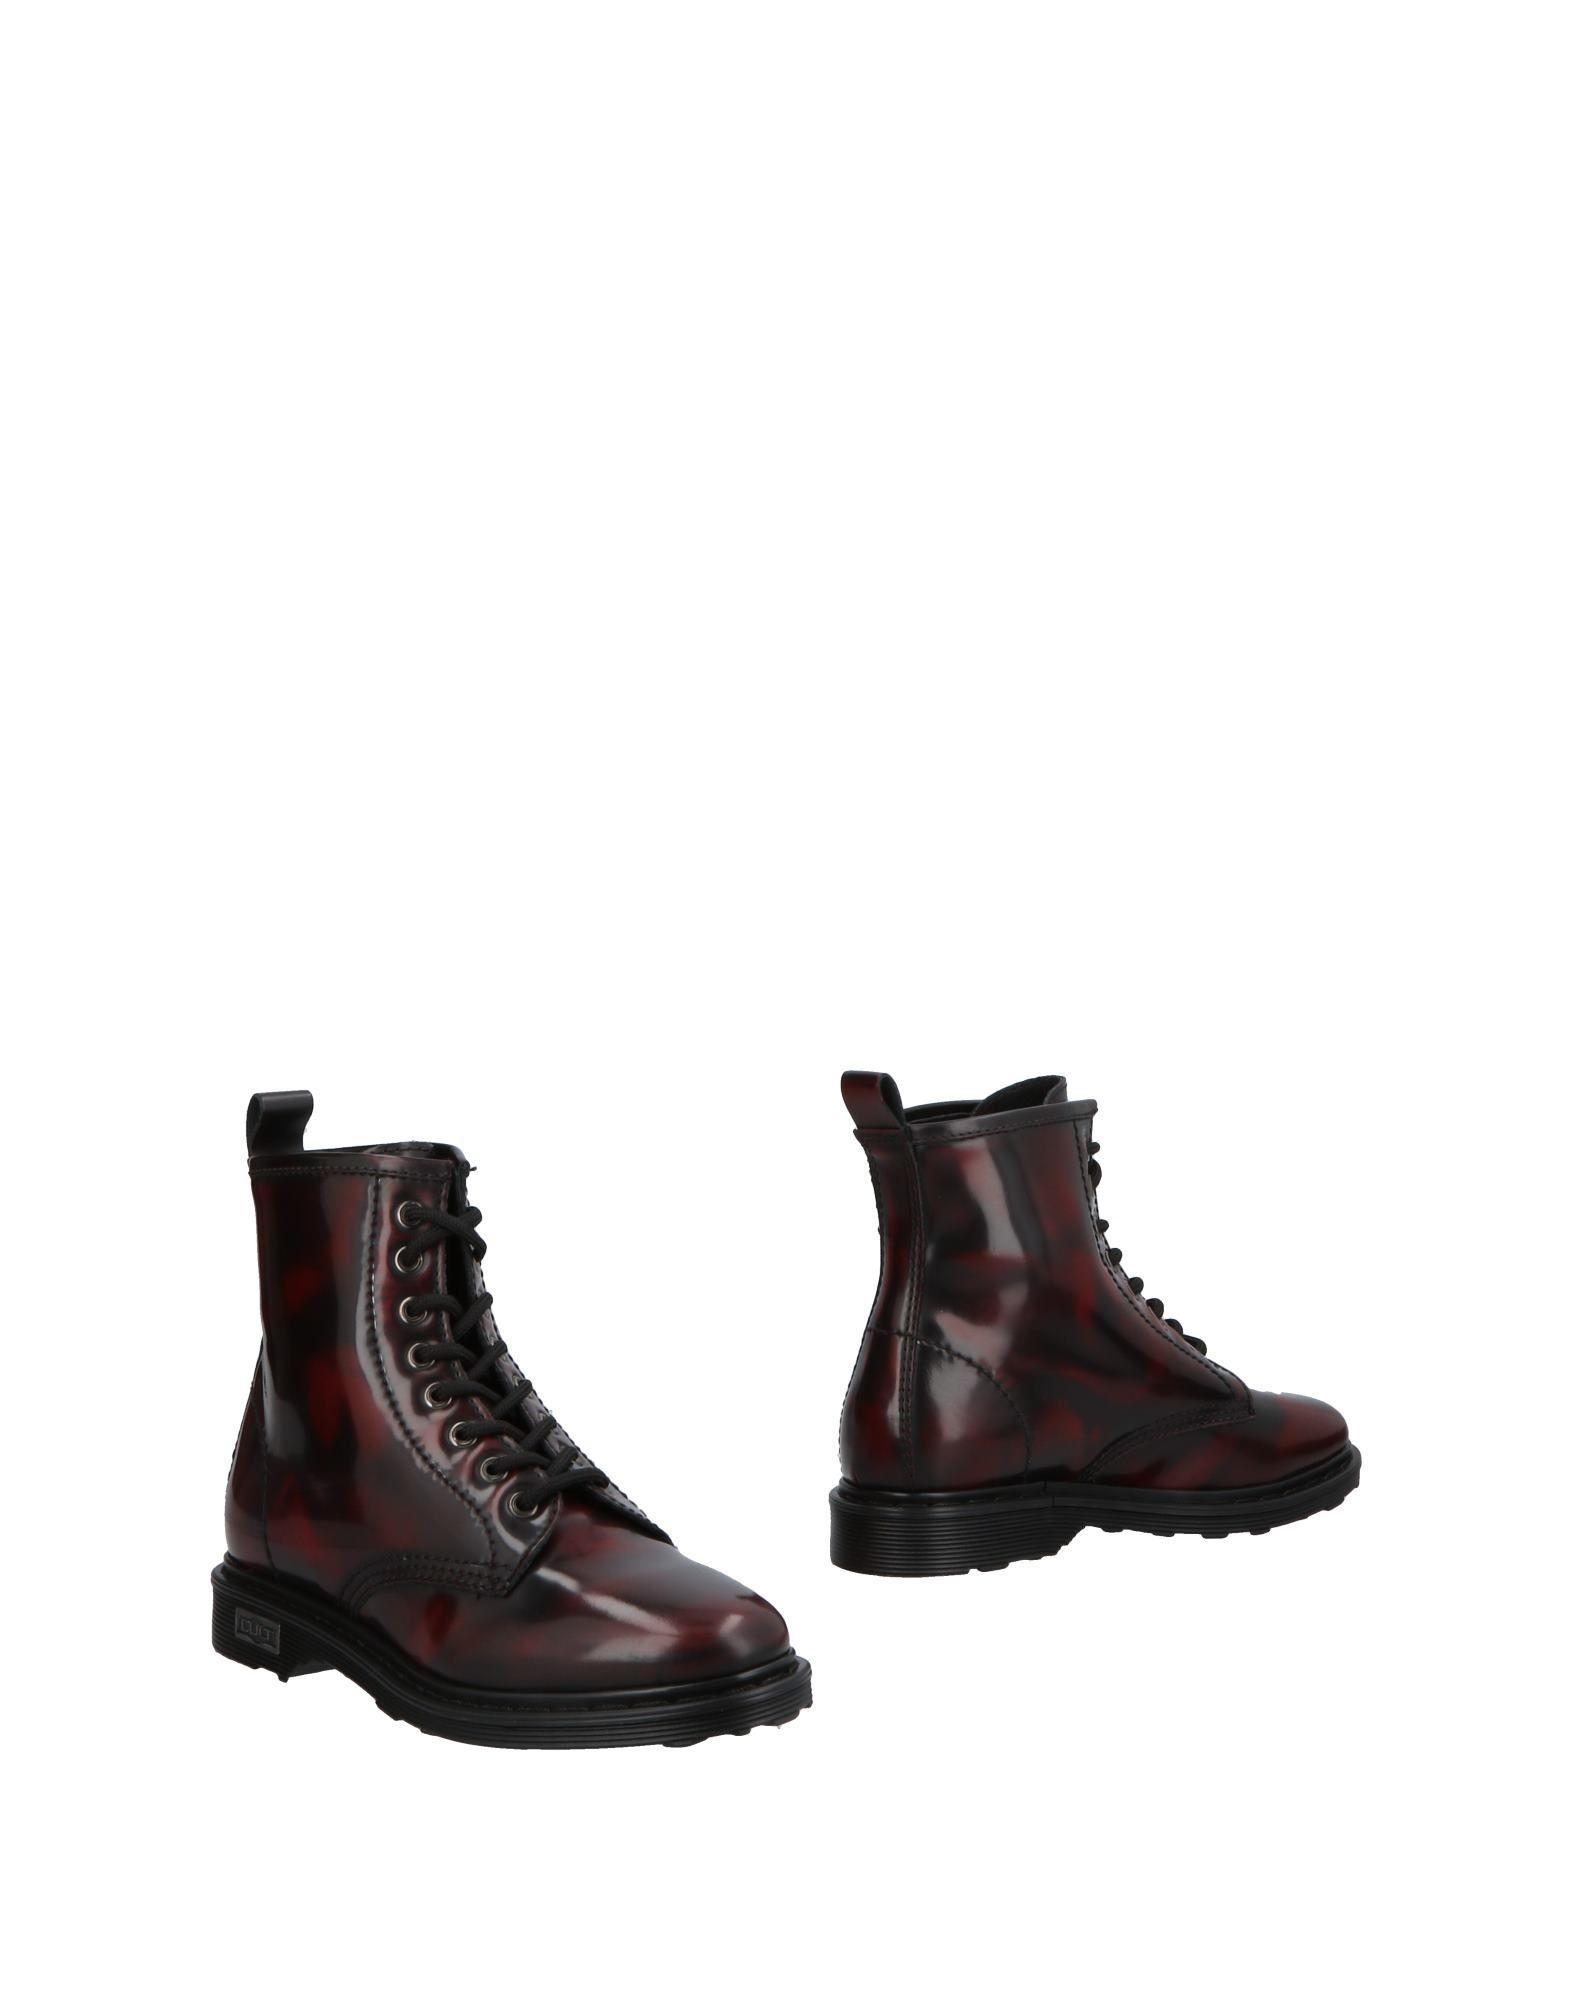 Cult Stiefelette Damen  11506808XA Gute Qualität beliebte Schuhe